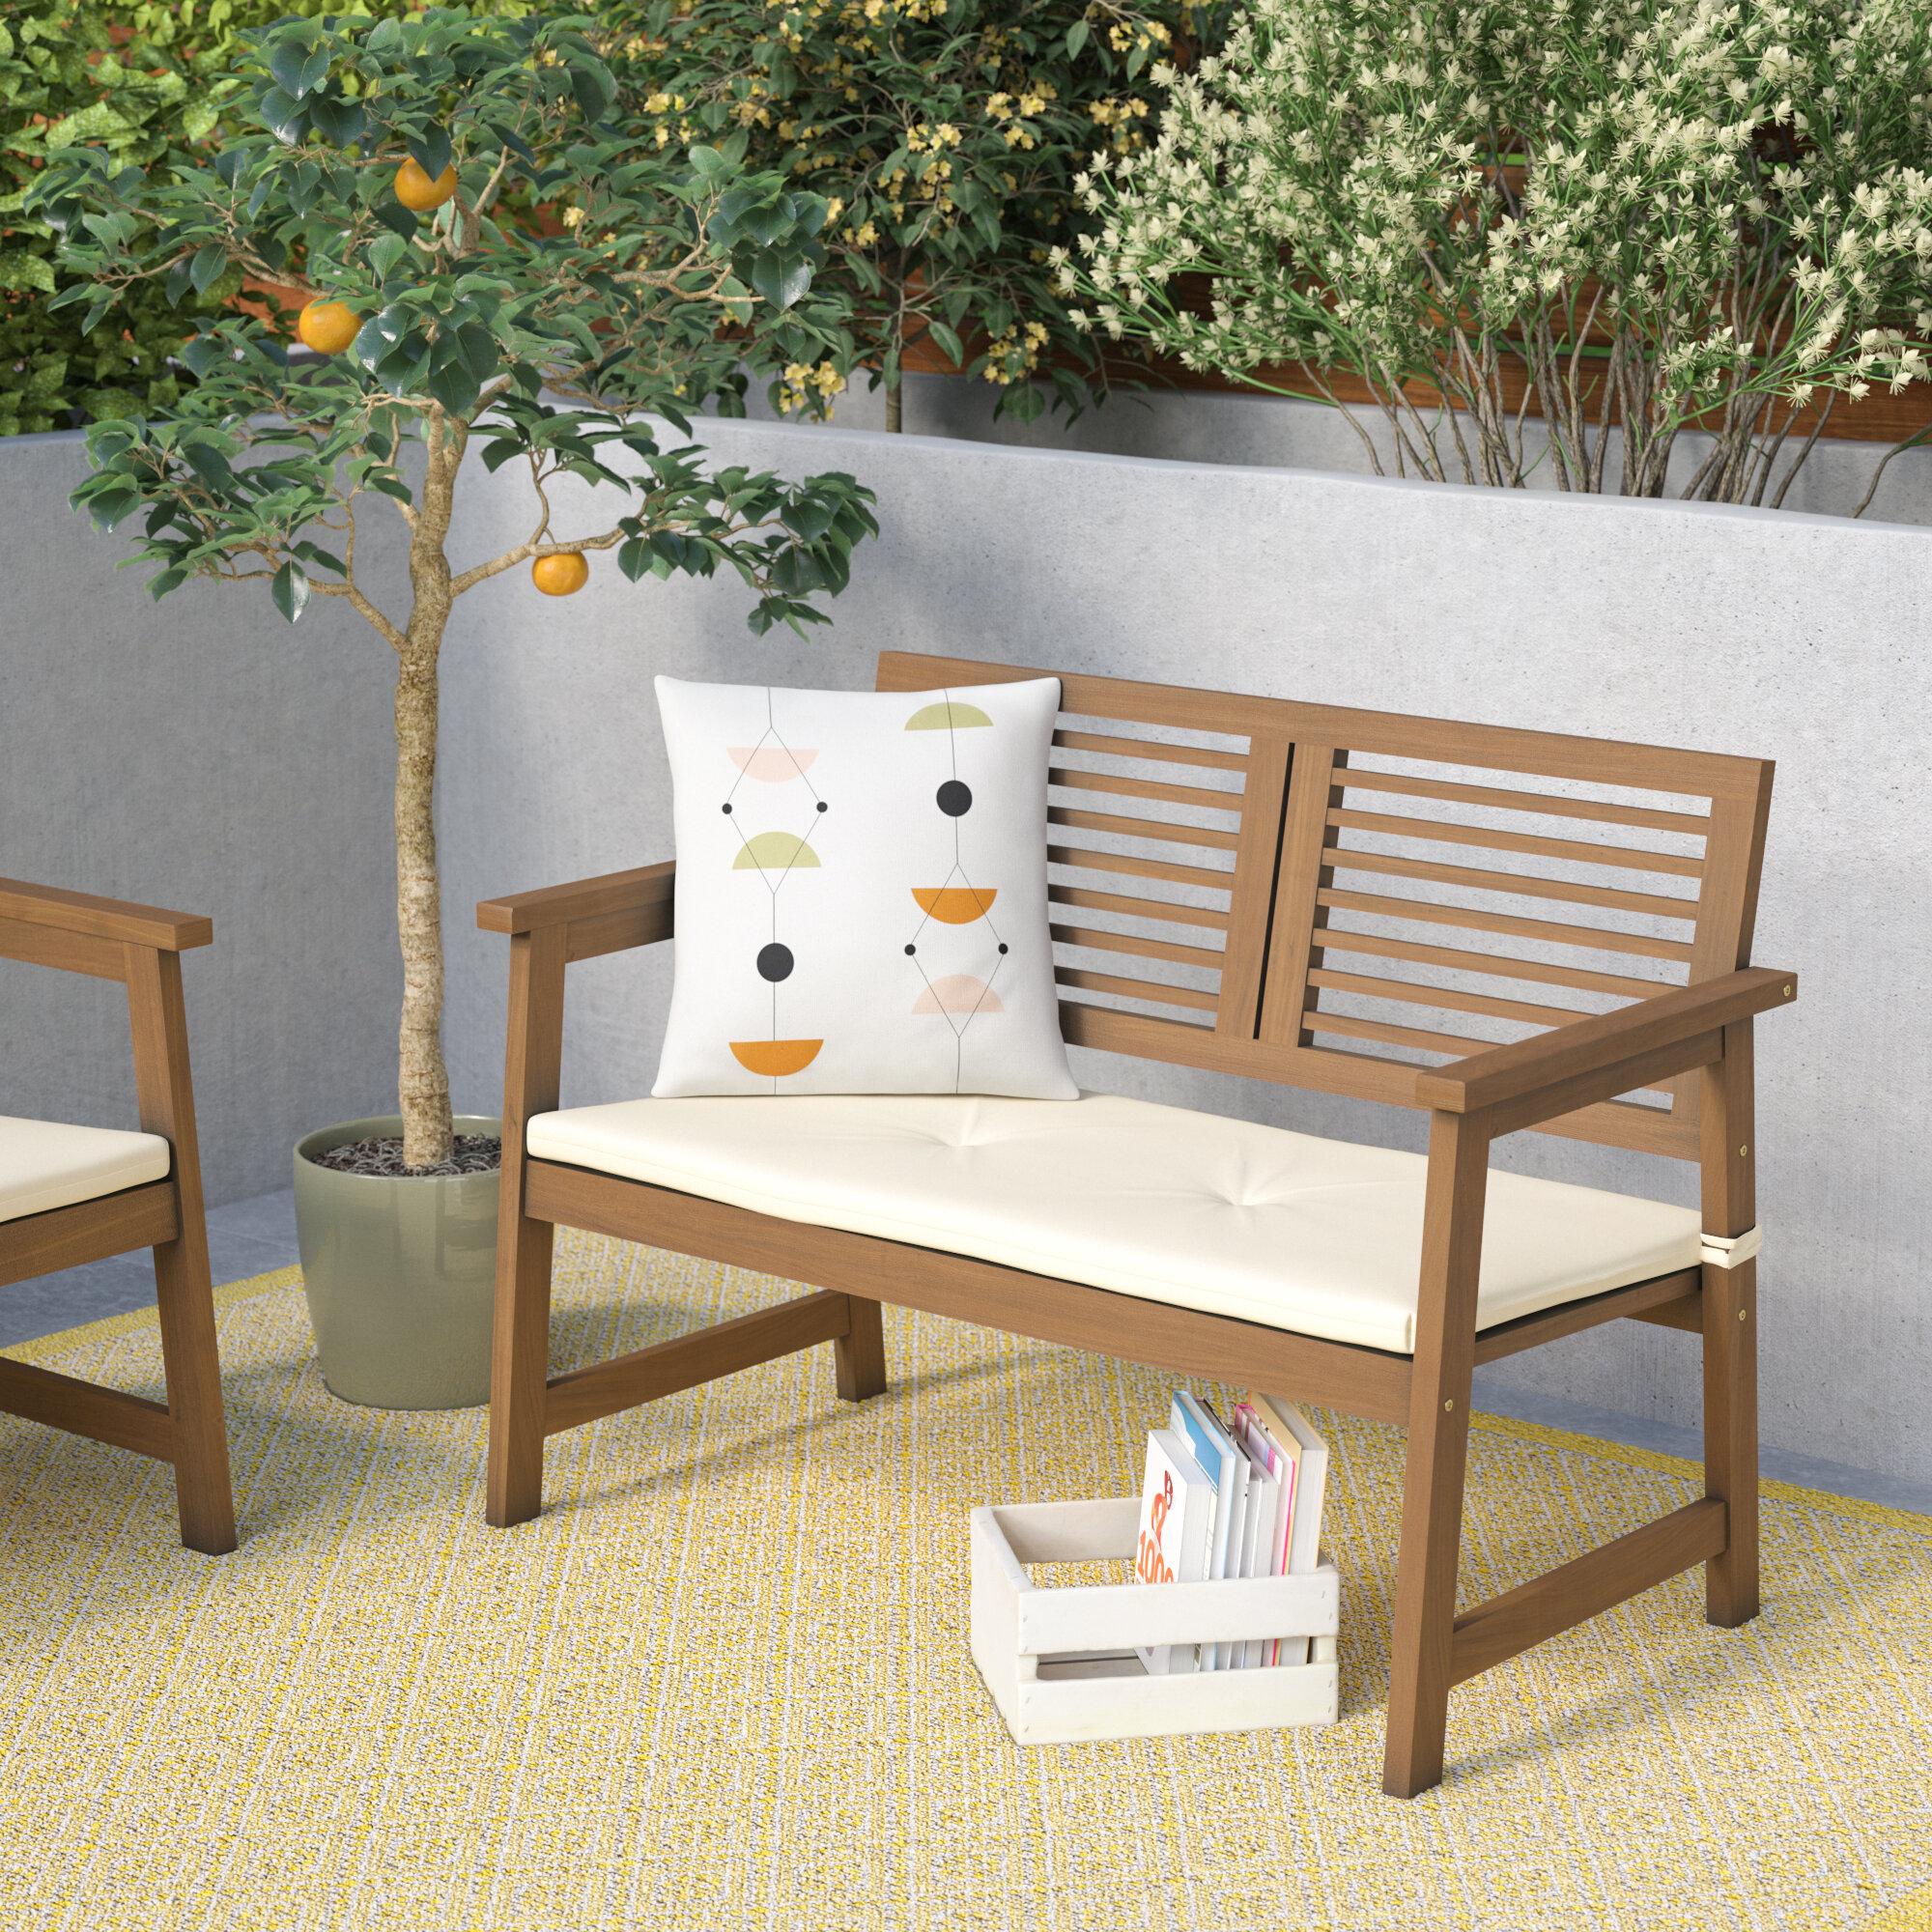 Arianna Meranti Wooden Garden Bench For Avoca Wood Garden Benches (View 15 of 25)